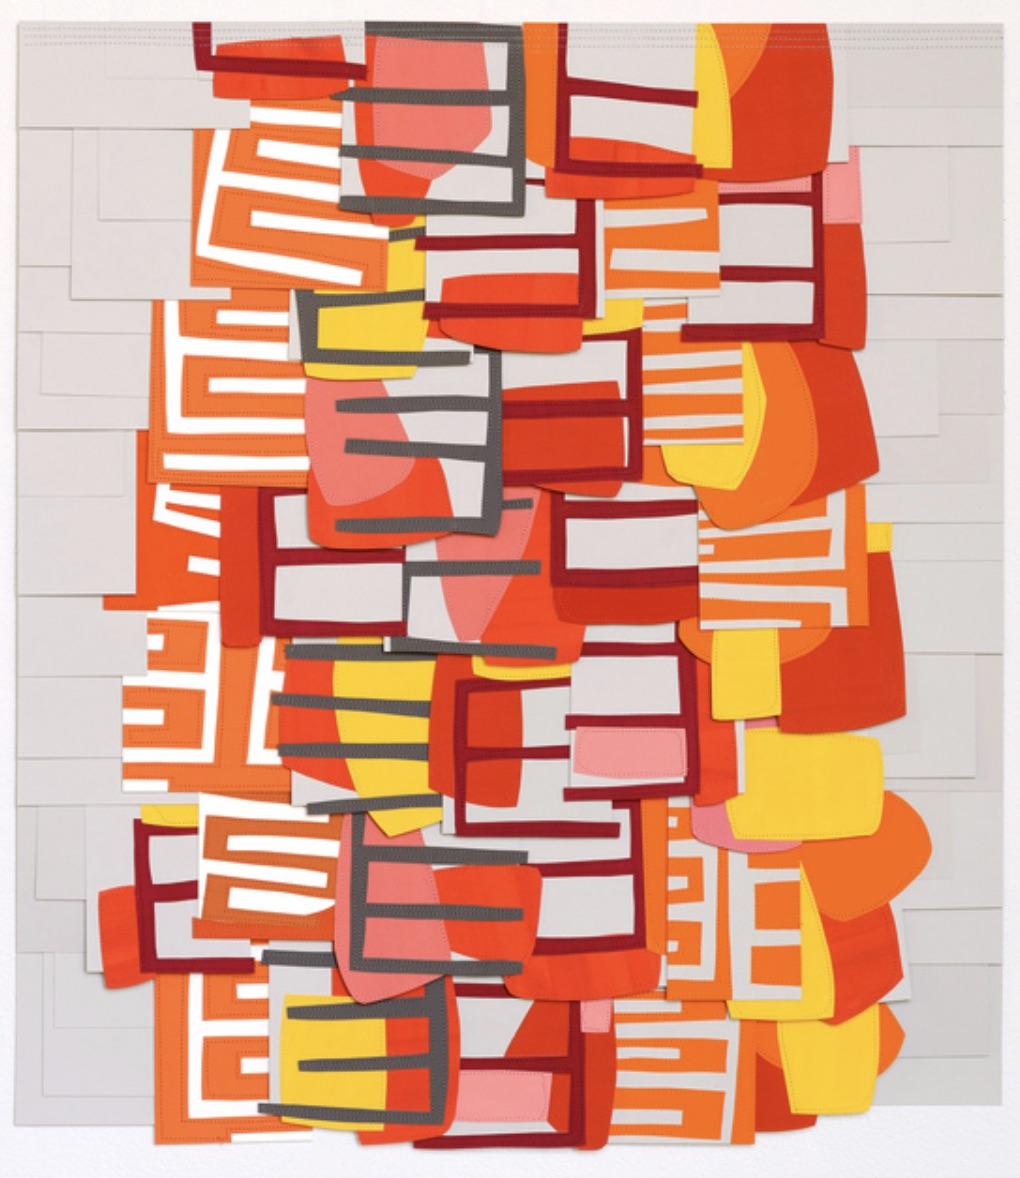 Raymond Saà , Untitled , 2017, Gouache collage on sewn canvas, 32 x 28 inches